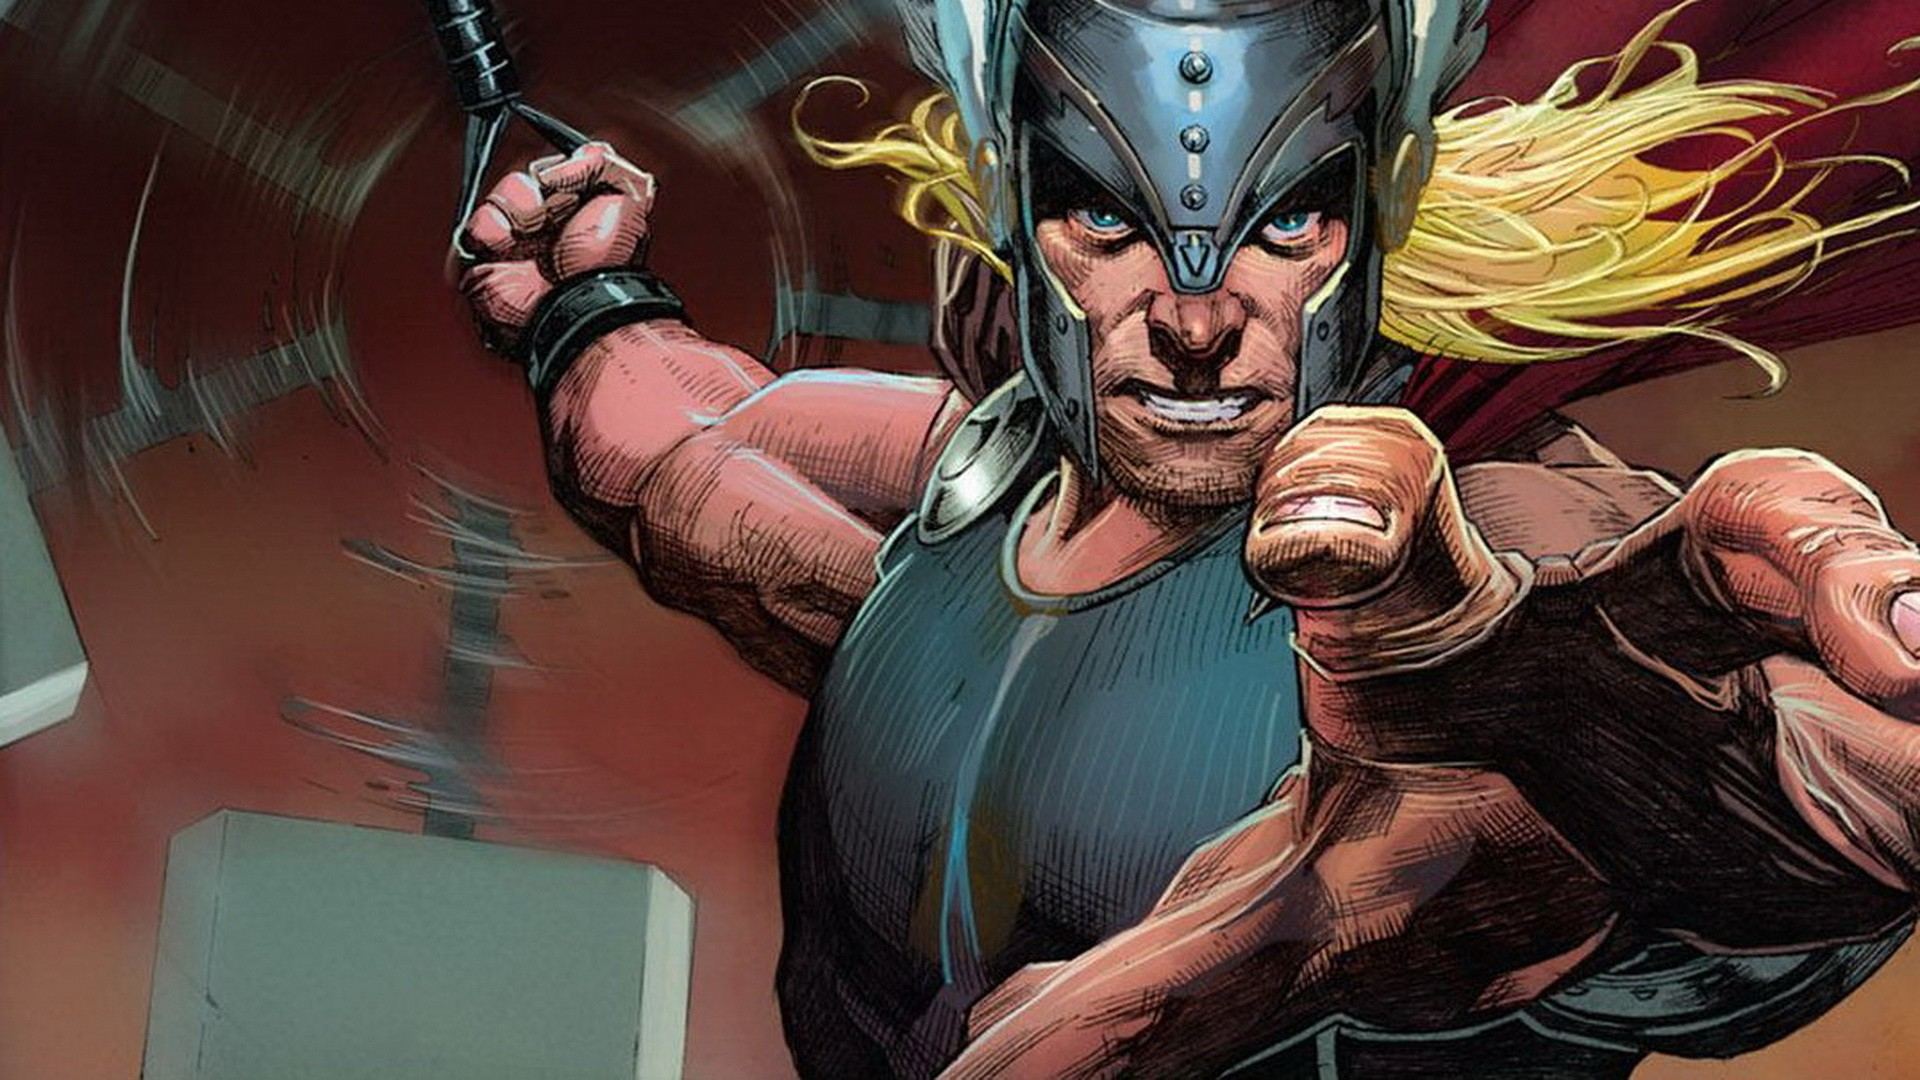 comics thor god hammer marvel comics norse avengers mjolnir comic